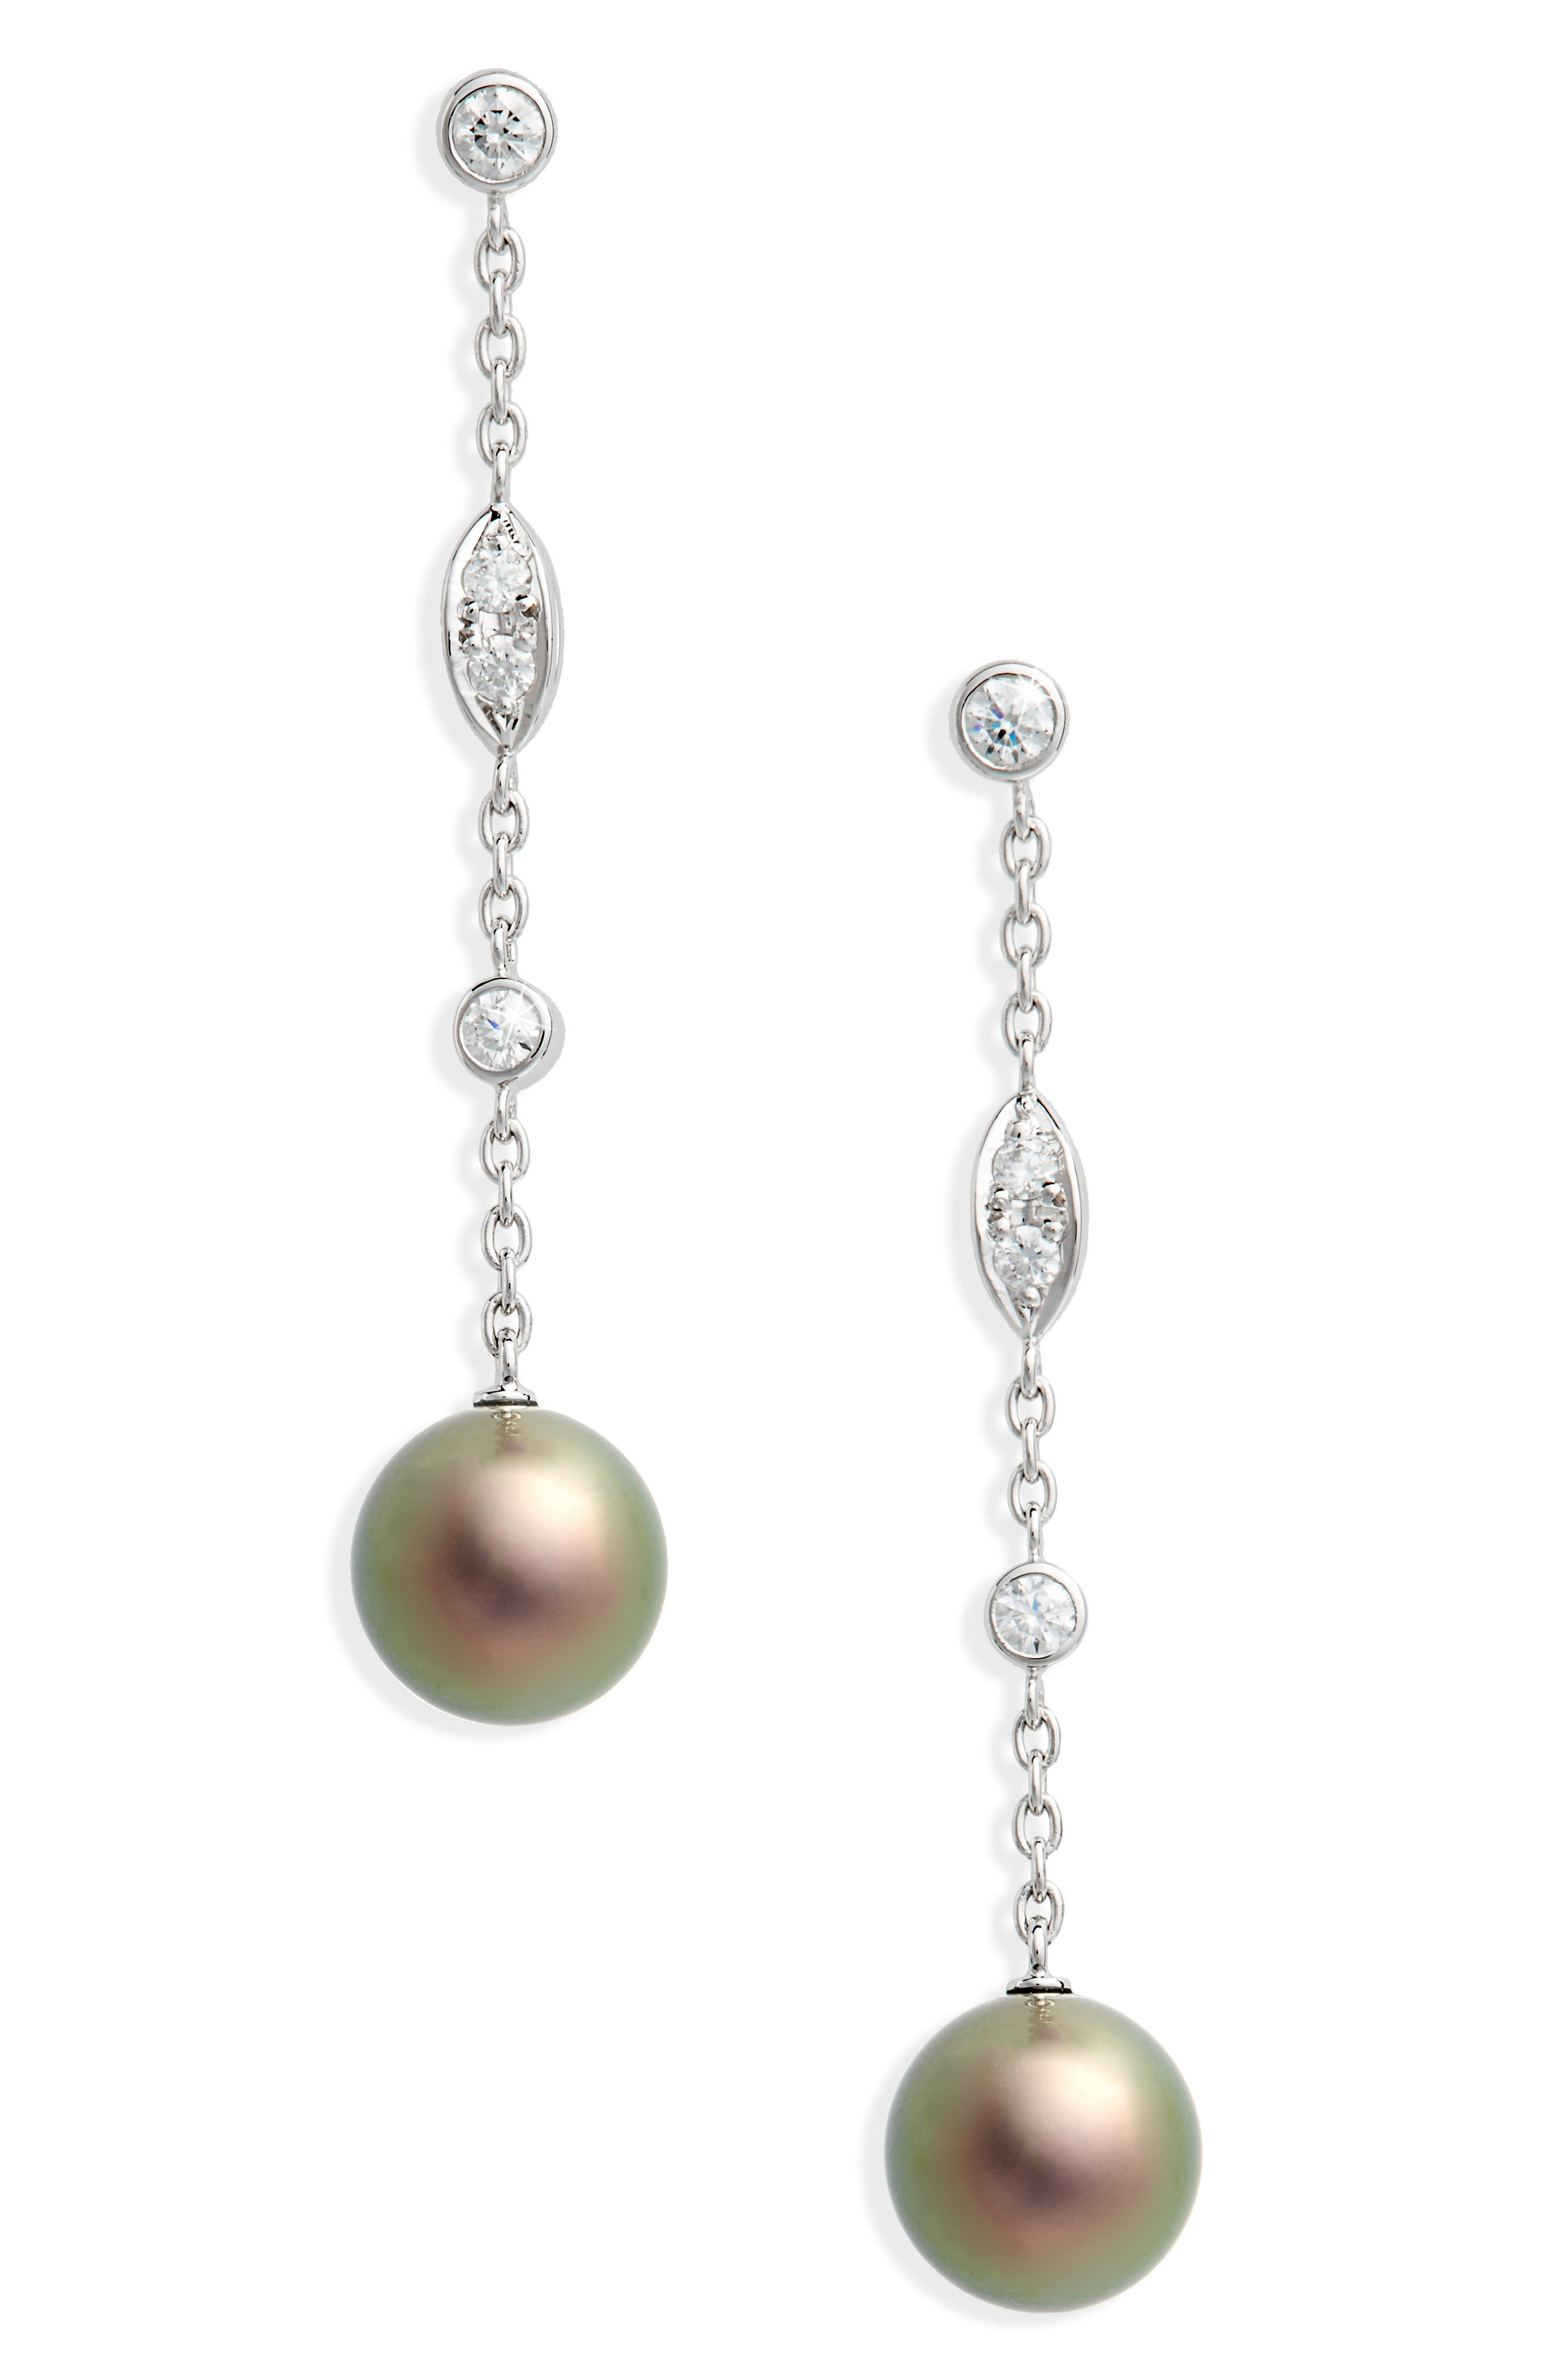 Black South Sea & Diamond Linear Drop Earrings,                             Main thumbnail 1, color,                             White Gold